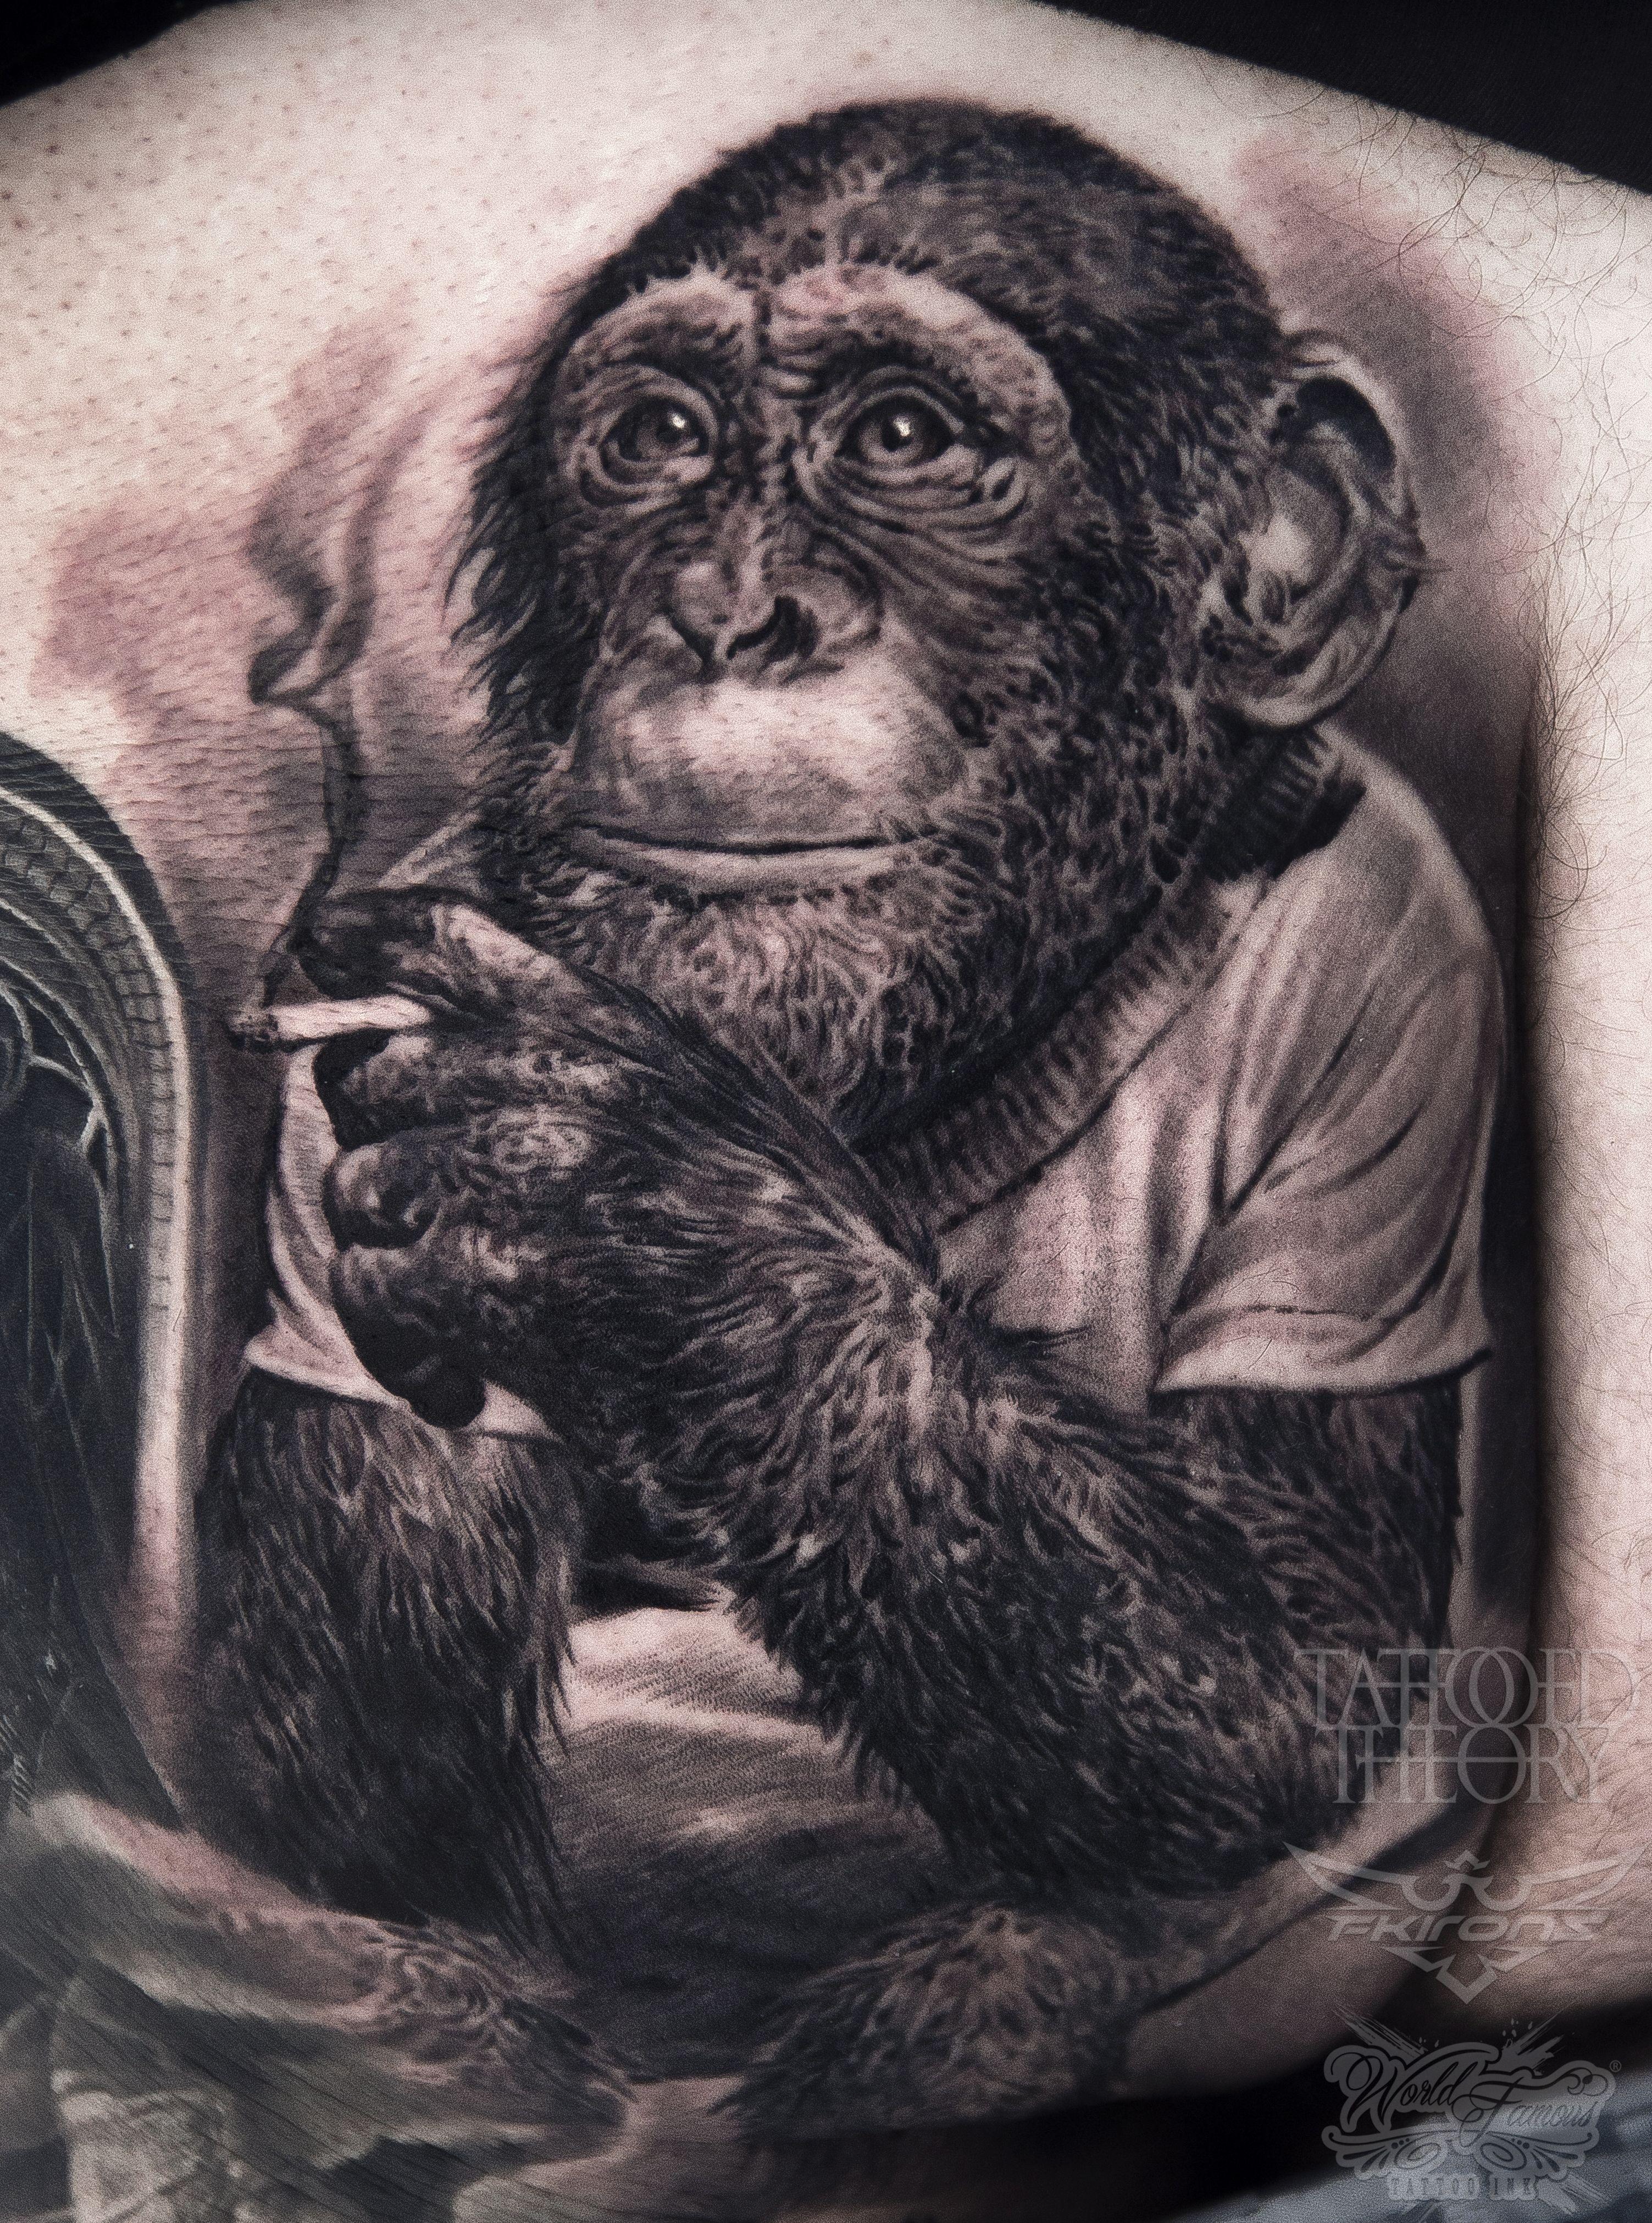 aa85de4fafa97 A cheeky monkey on a cheeky monkey's cheek! Chimpanzee Smoking Tattoo by  Javi Antunez owner and artist of Tattooed Theory